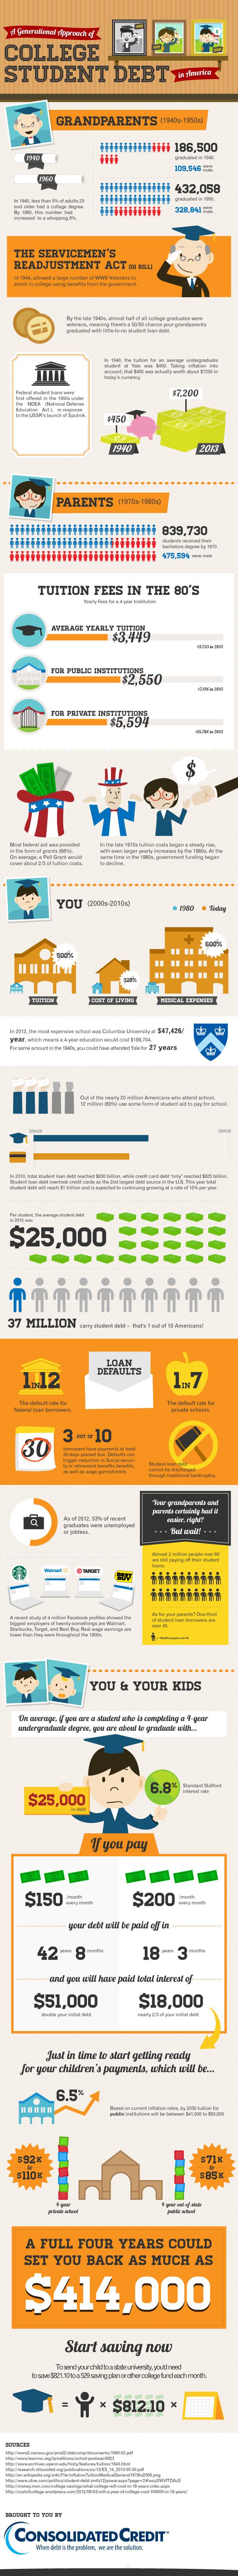 CCUS-Student Debt Infographic